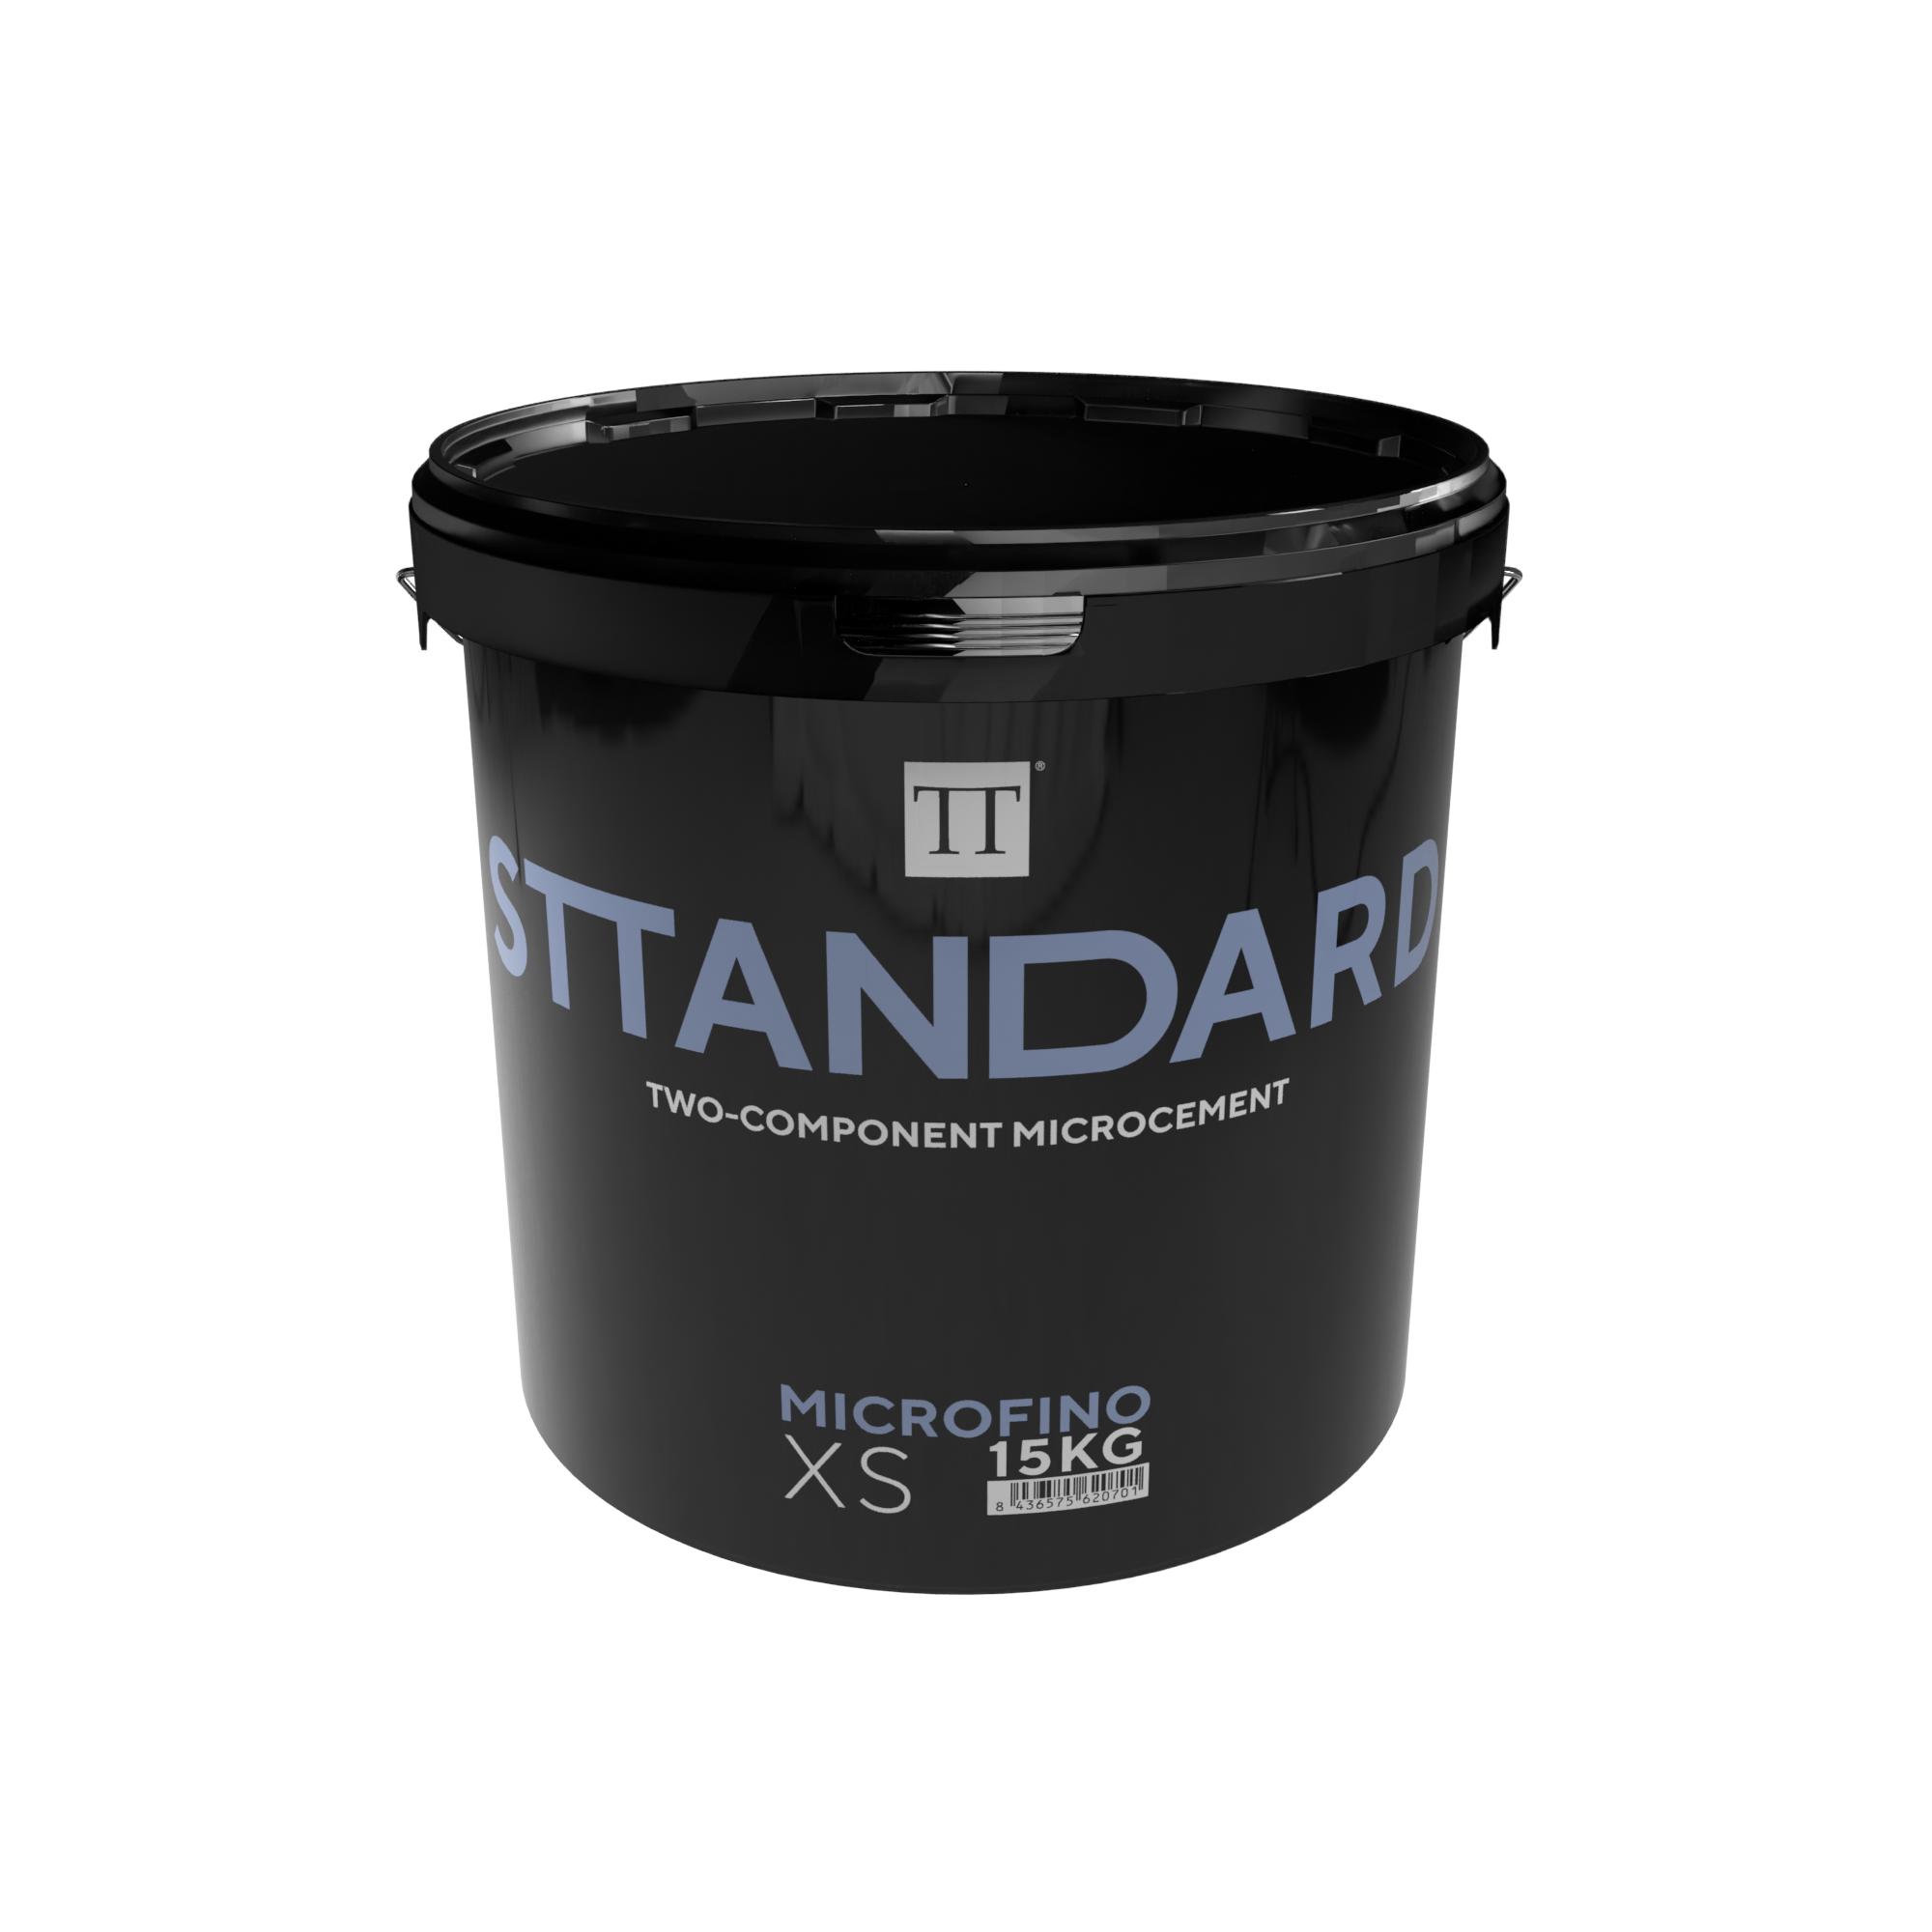 Sttandard Microfino XS